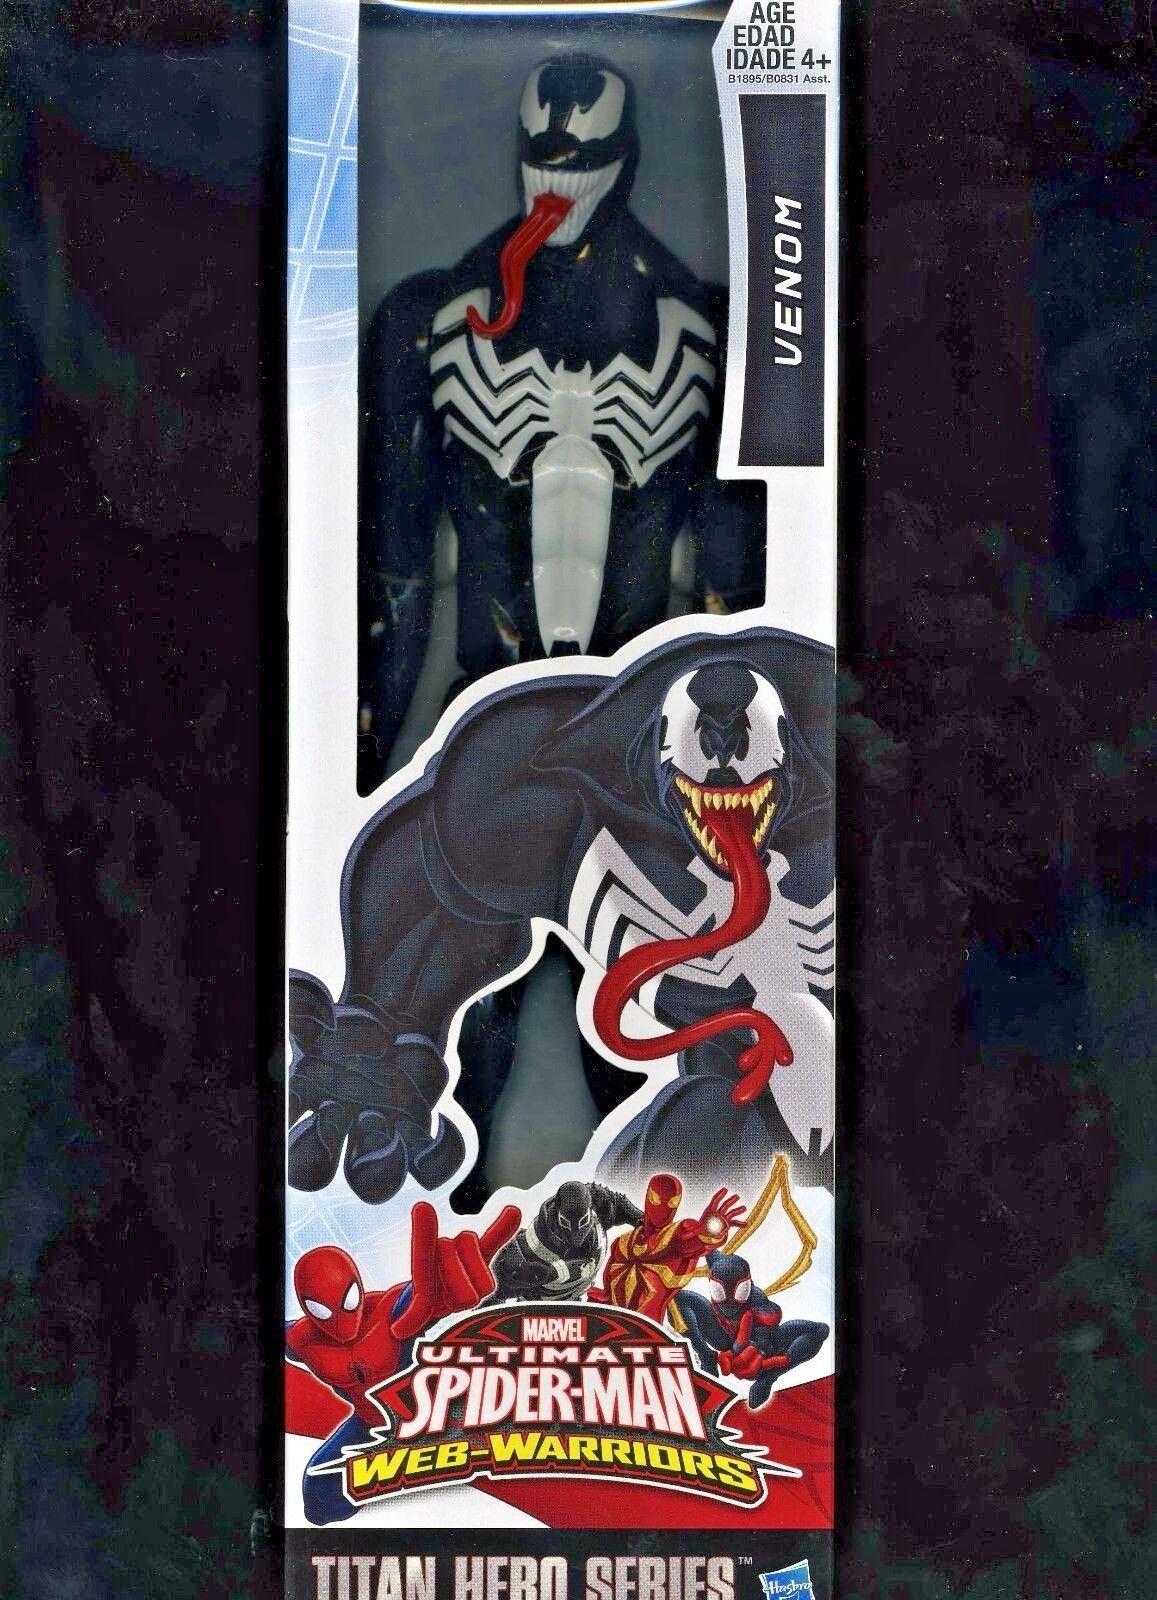 Venom (12 )  ULTIMATE SPIDER-homme (Web-Guerriers) Titan Hero Series Figure Action  juste l'acheter